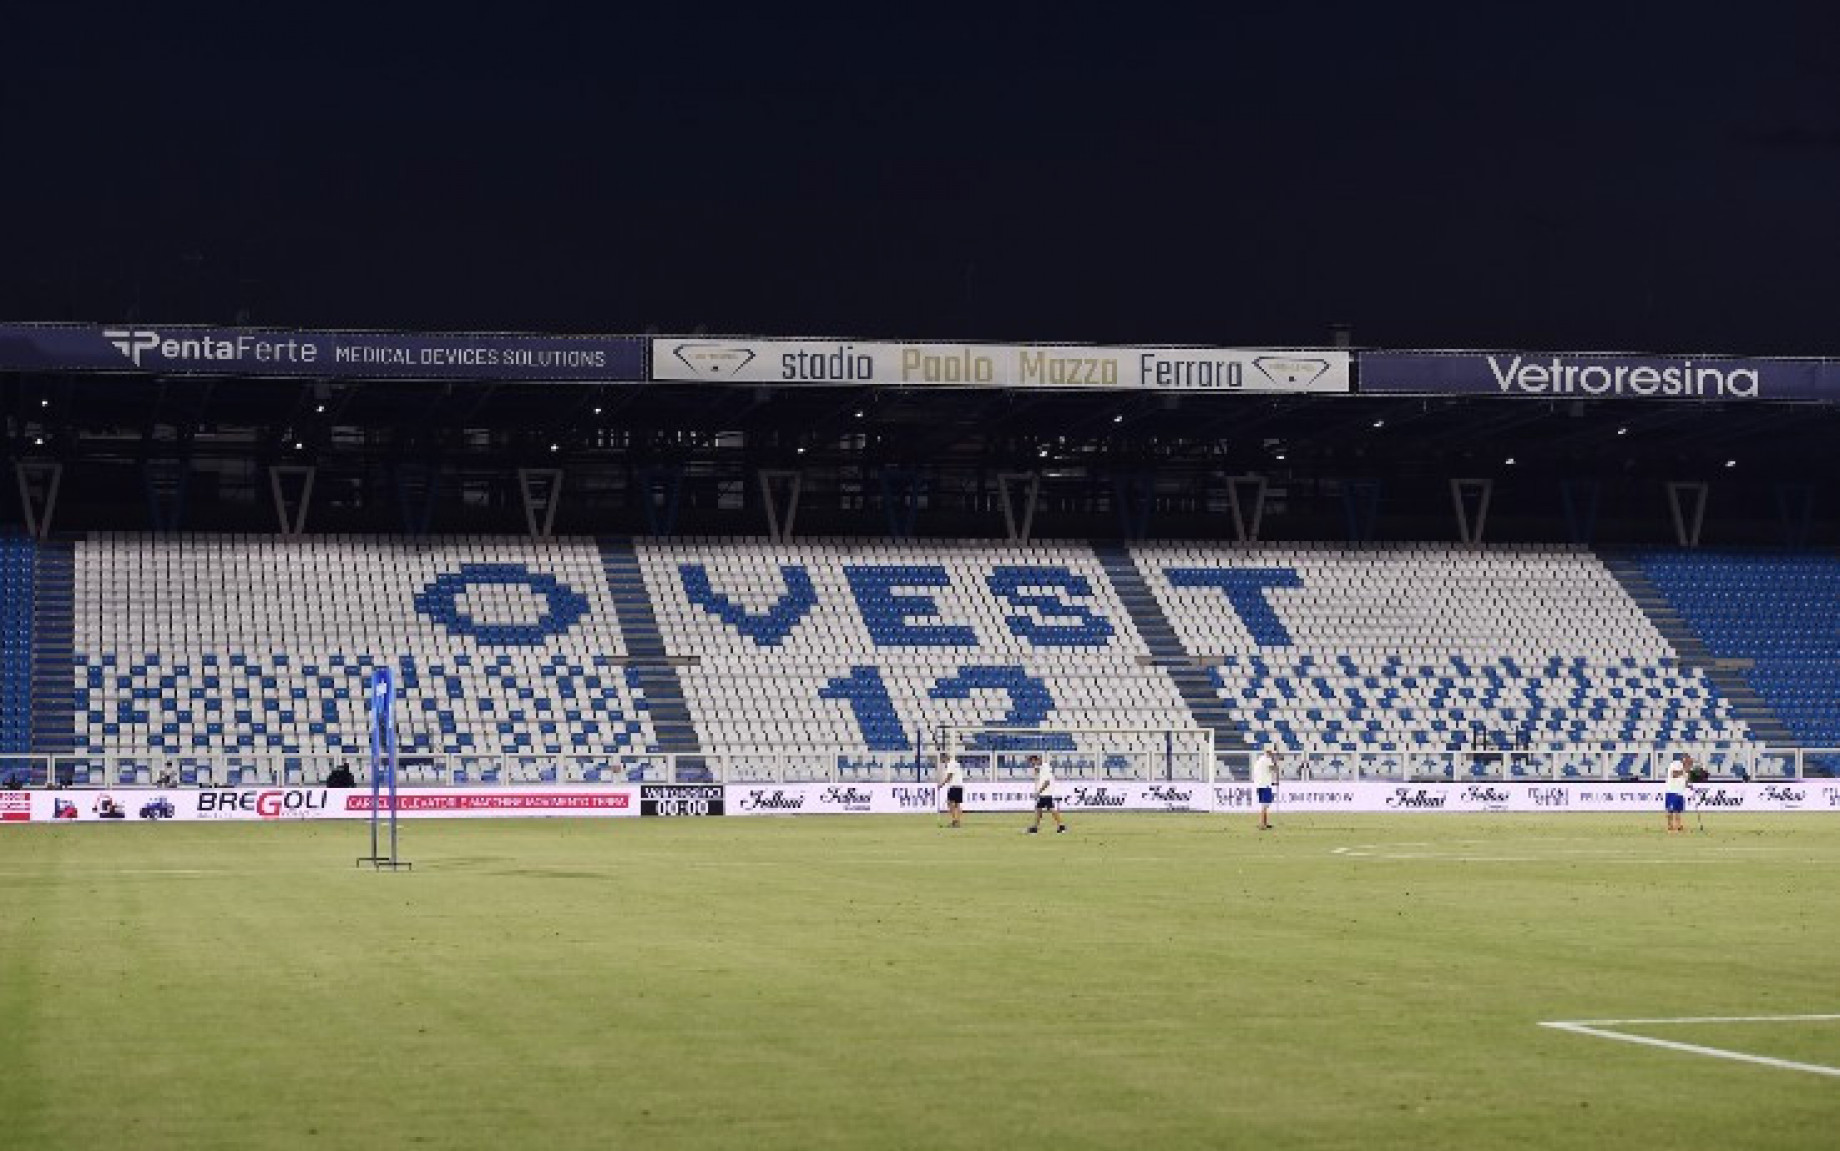 stadio_mazza_spal_image.jpg